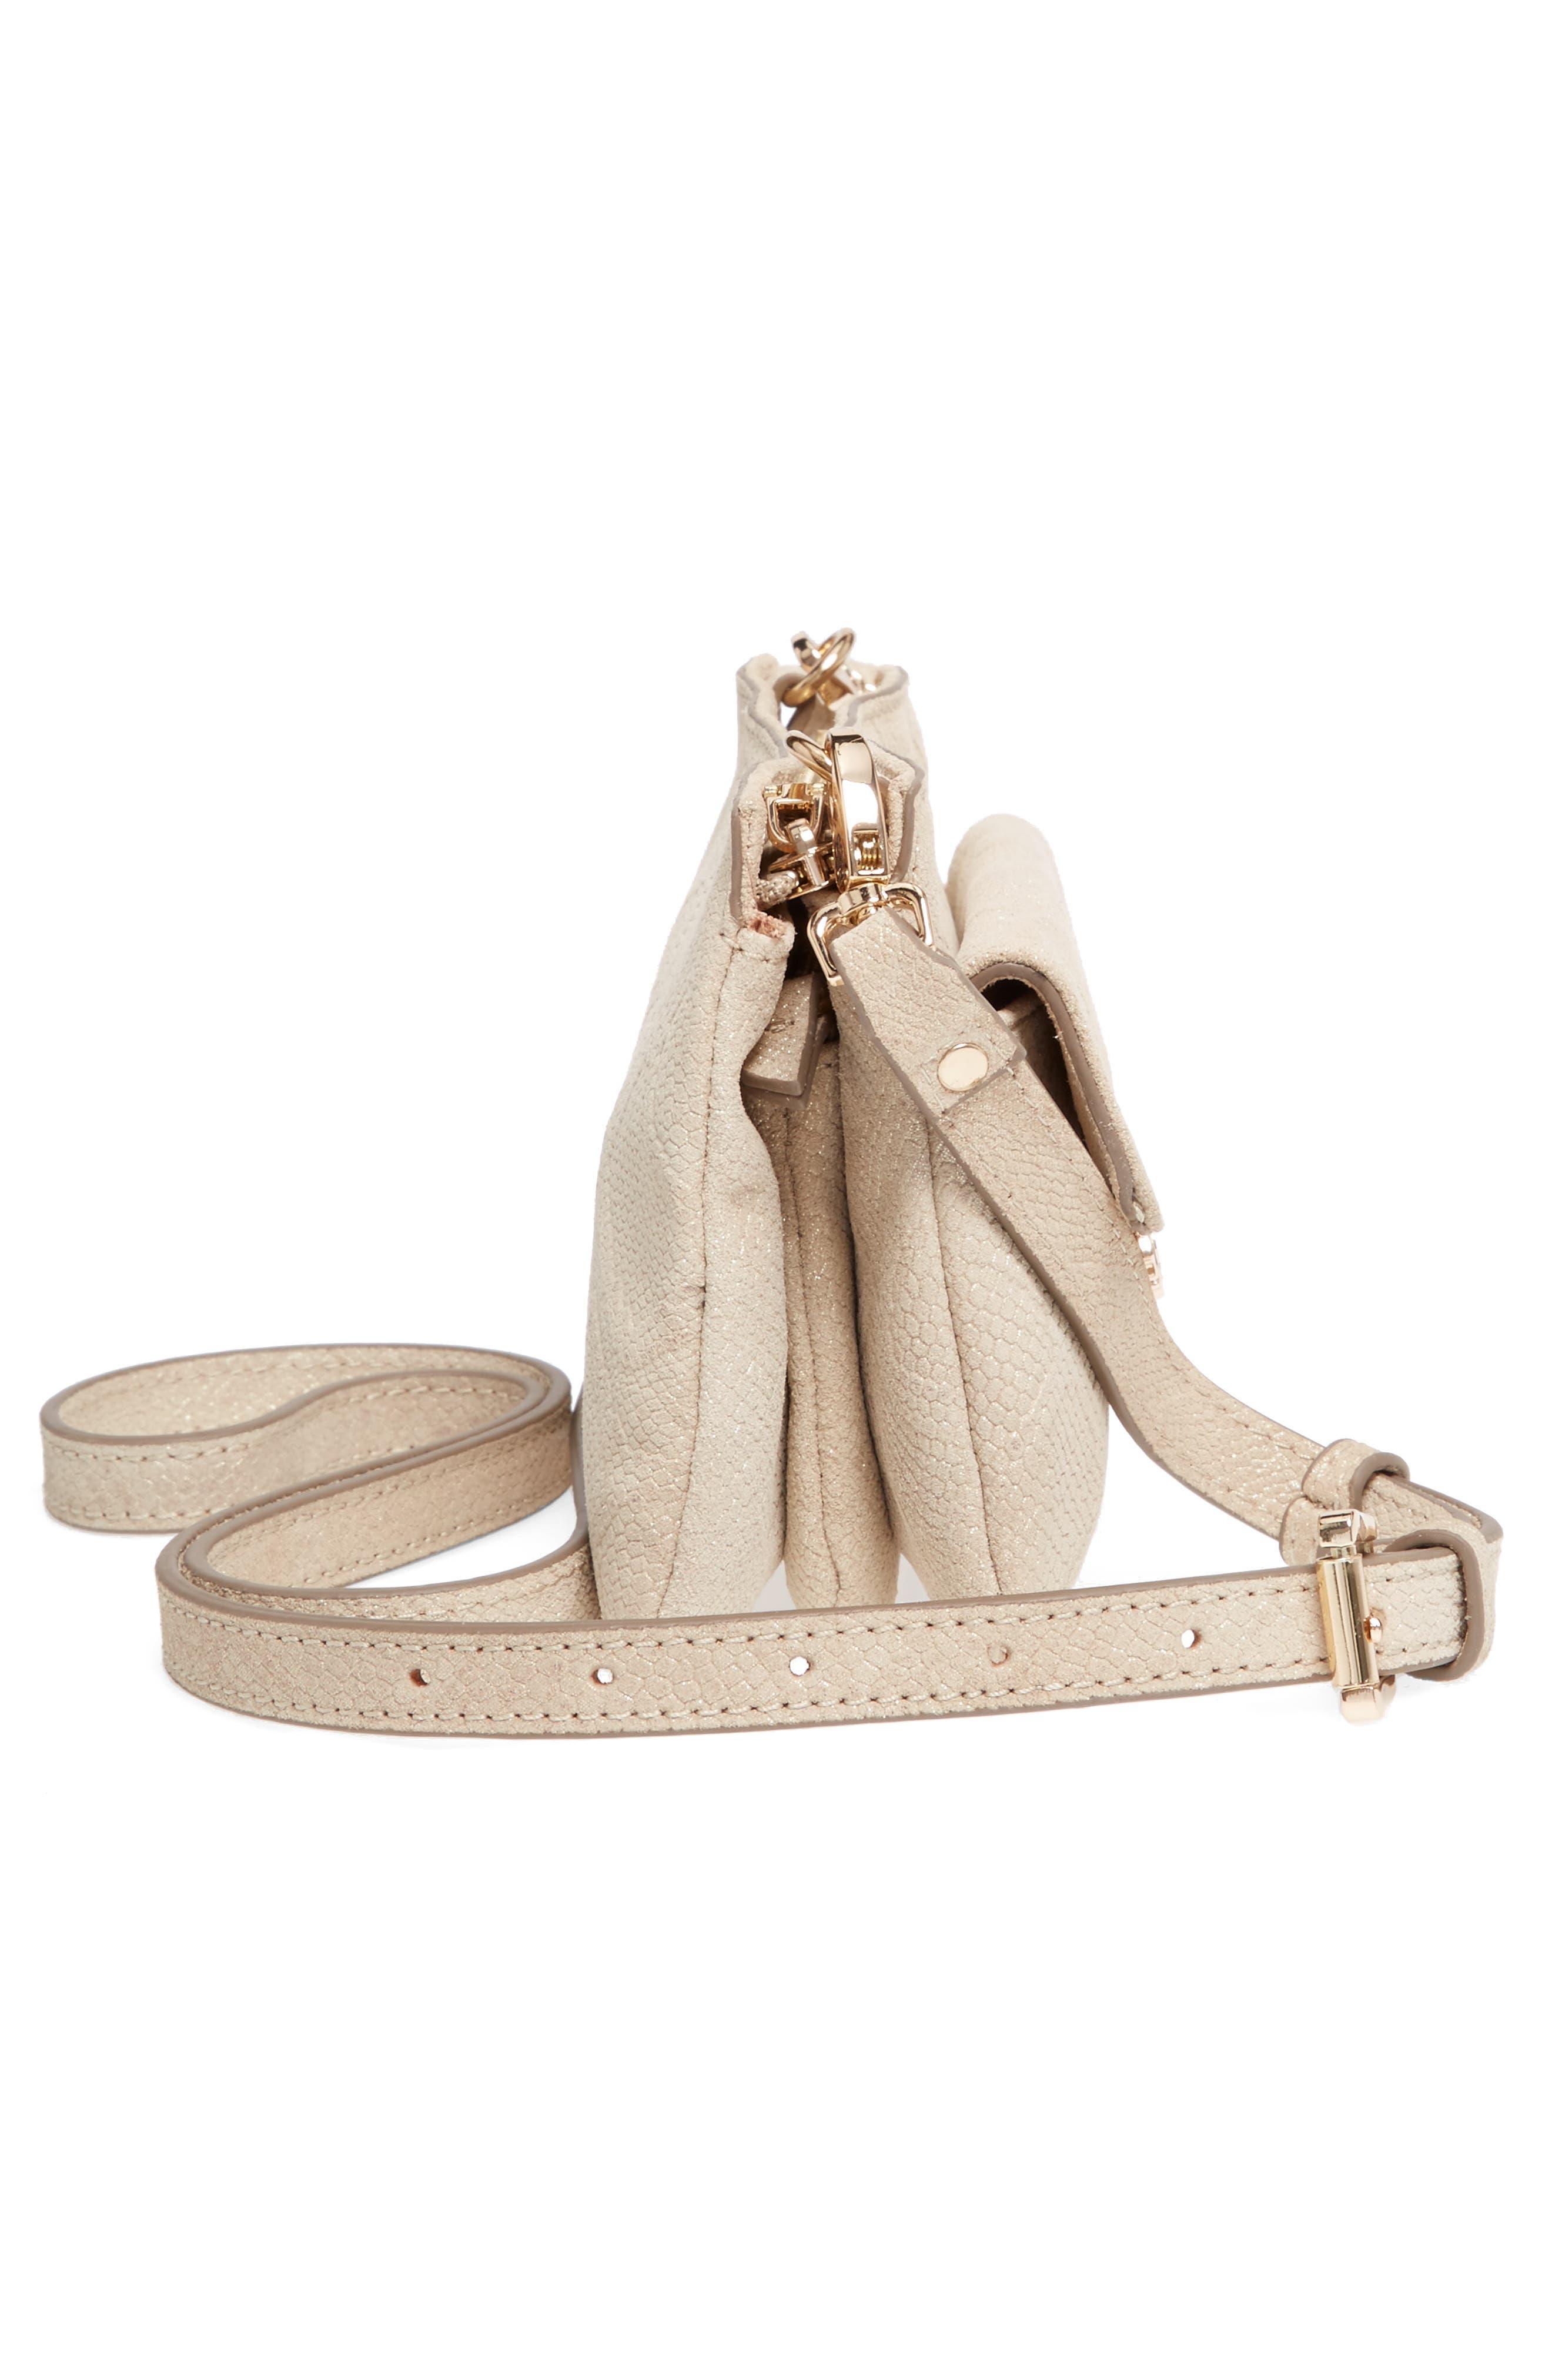 Katerini Leather Crossbody Wallet,                             Alternate thumbnail 30, color,